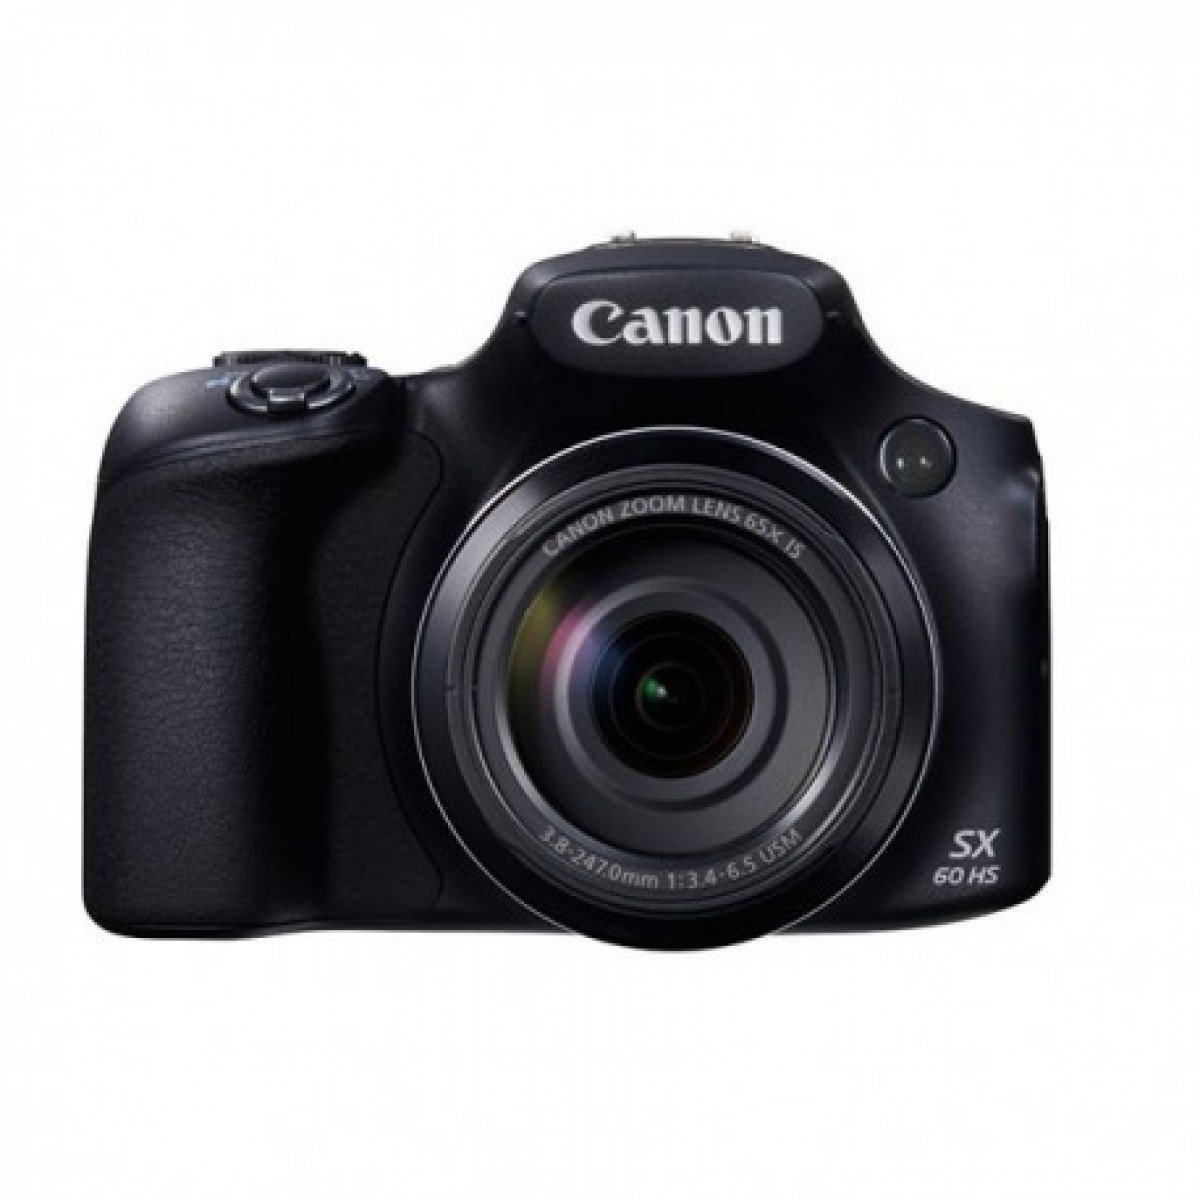 CANON - Appareil photo PowerShot SX60 HS prix tunisie